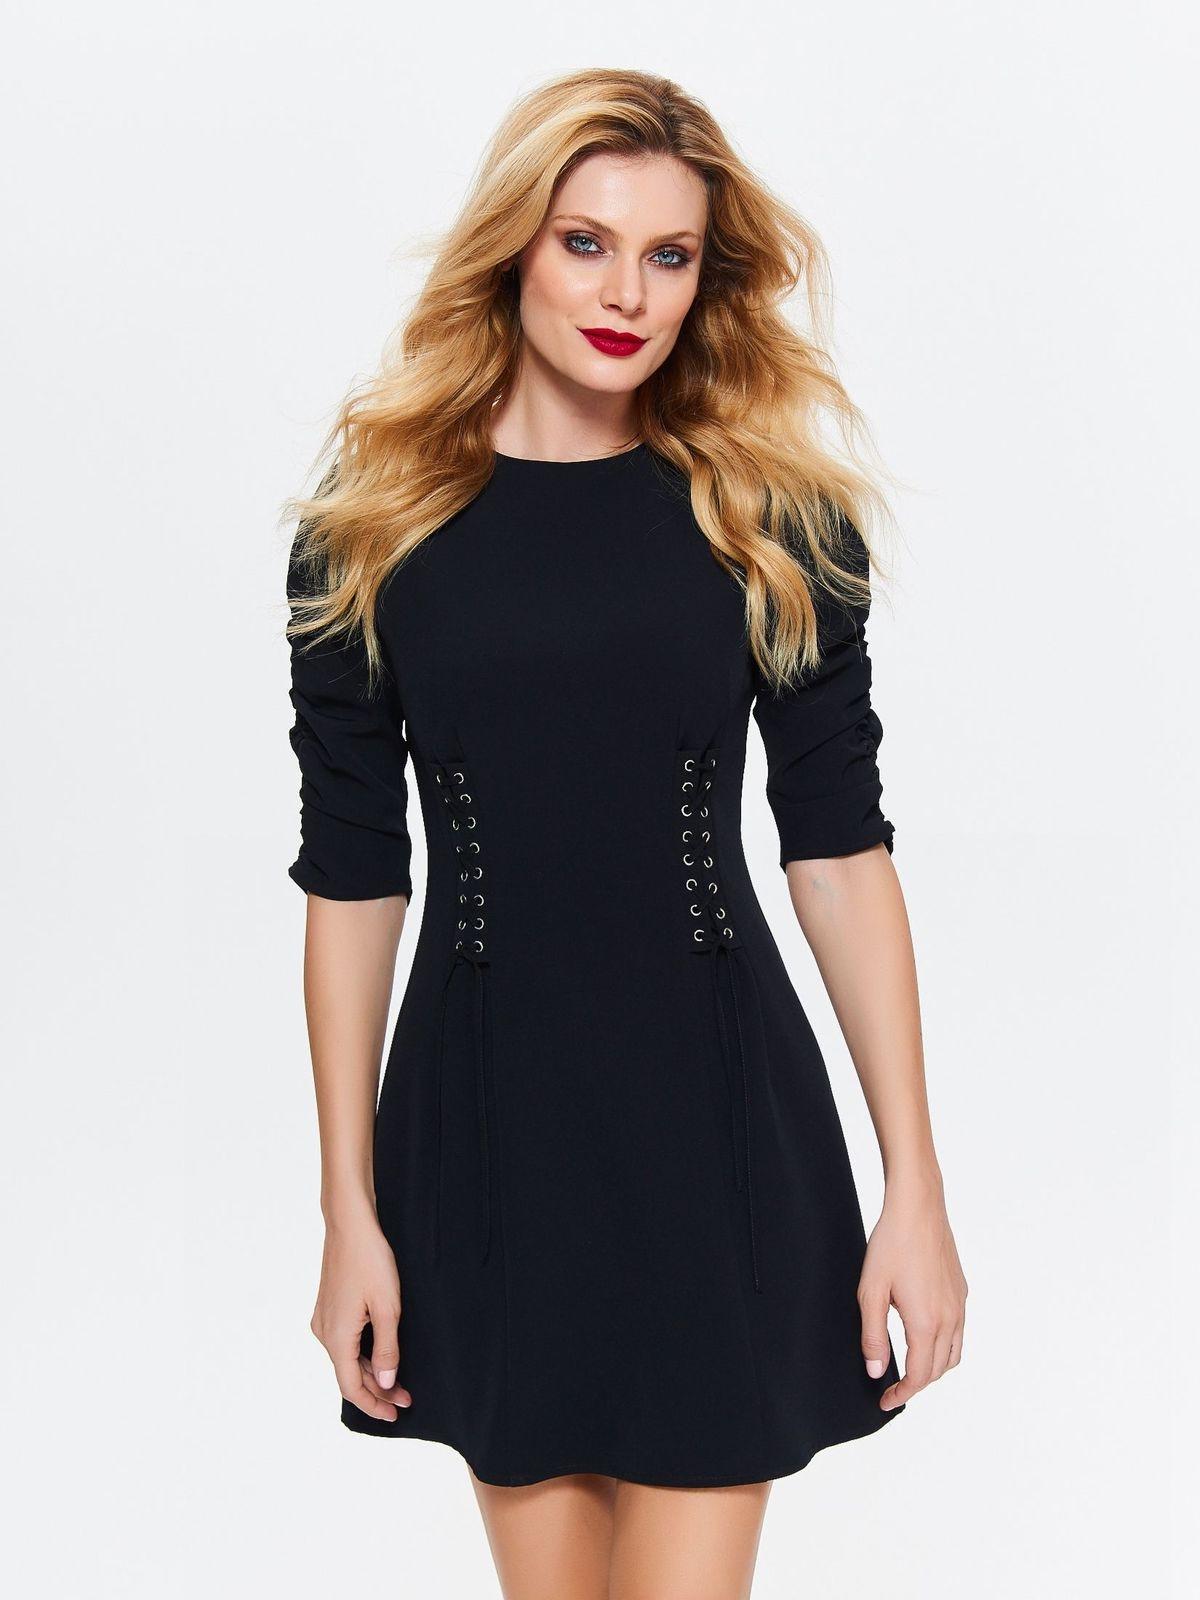 top secret μινι φορεμα